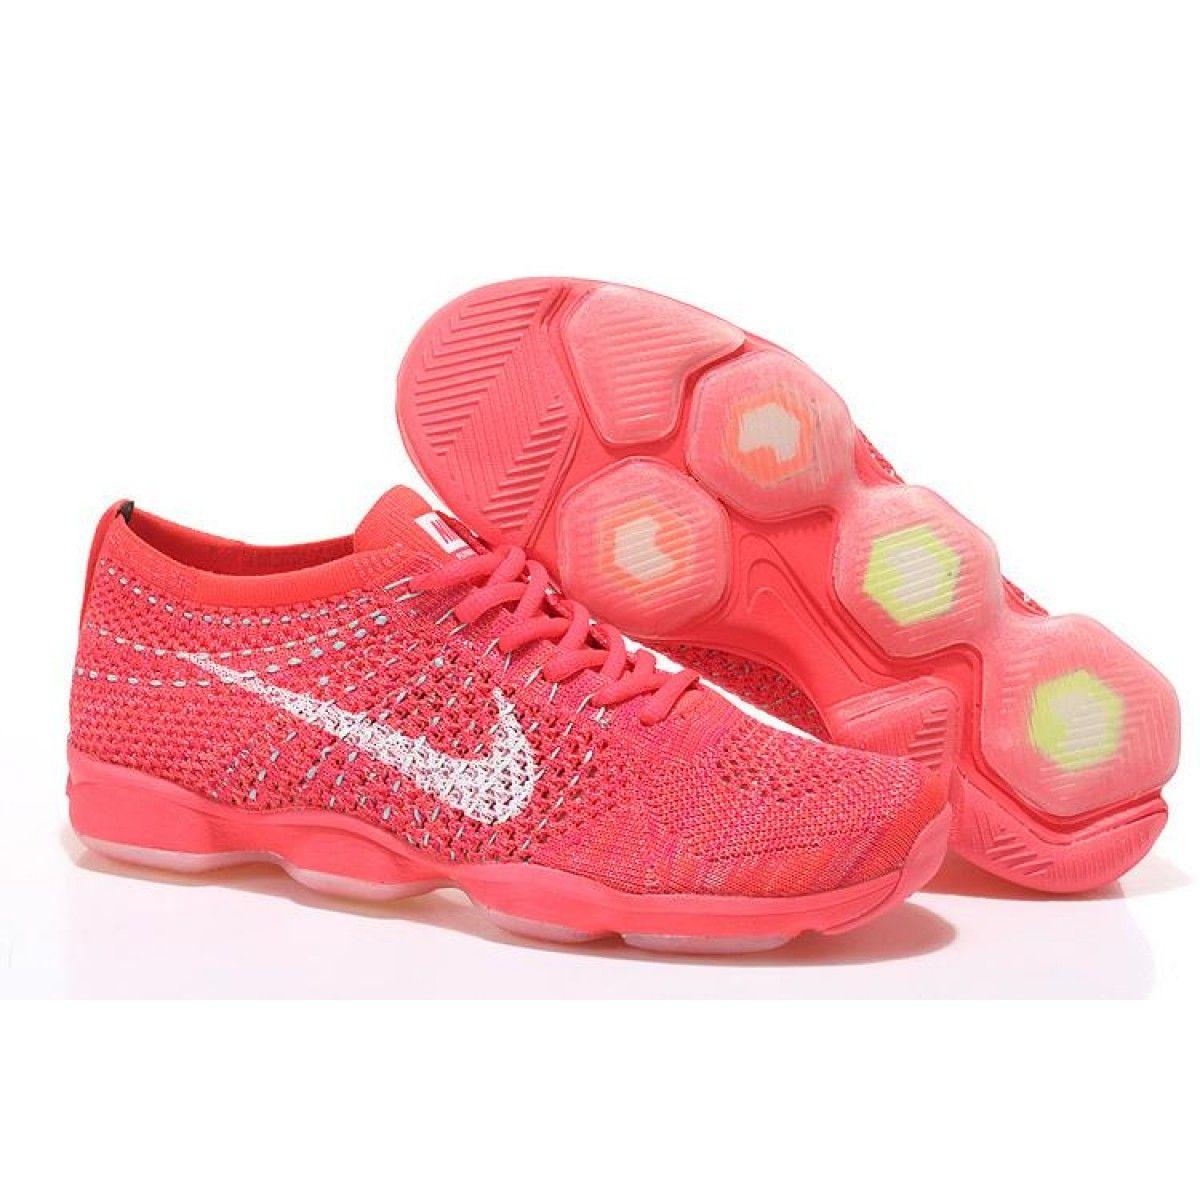 Avanzar Pólvora Penetración  Nike Flyknit Zoom Agility : half off nike free run   air max 90 hot sale    Nike shoes women flyknit, Nike shoes women, Nike shoes cheap